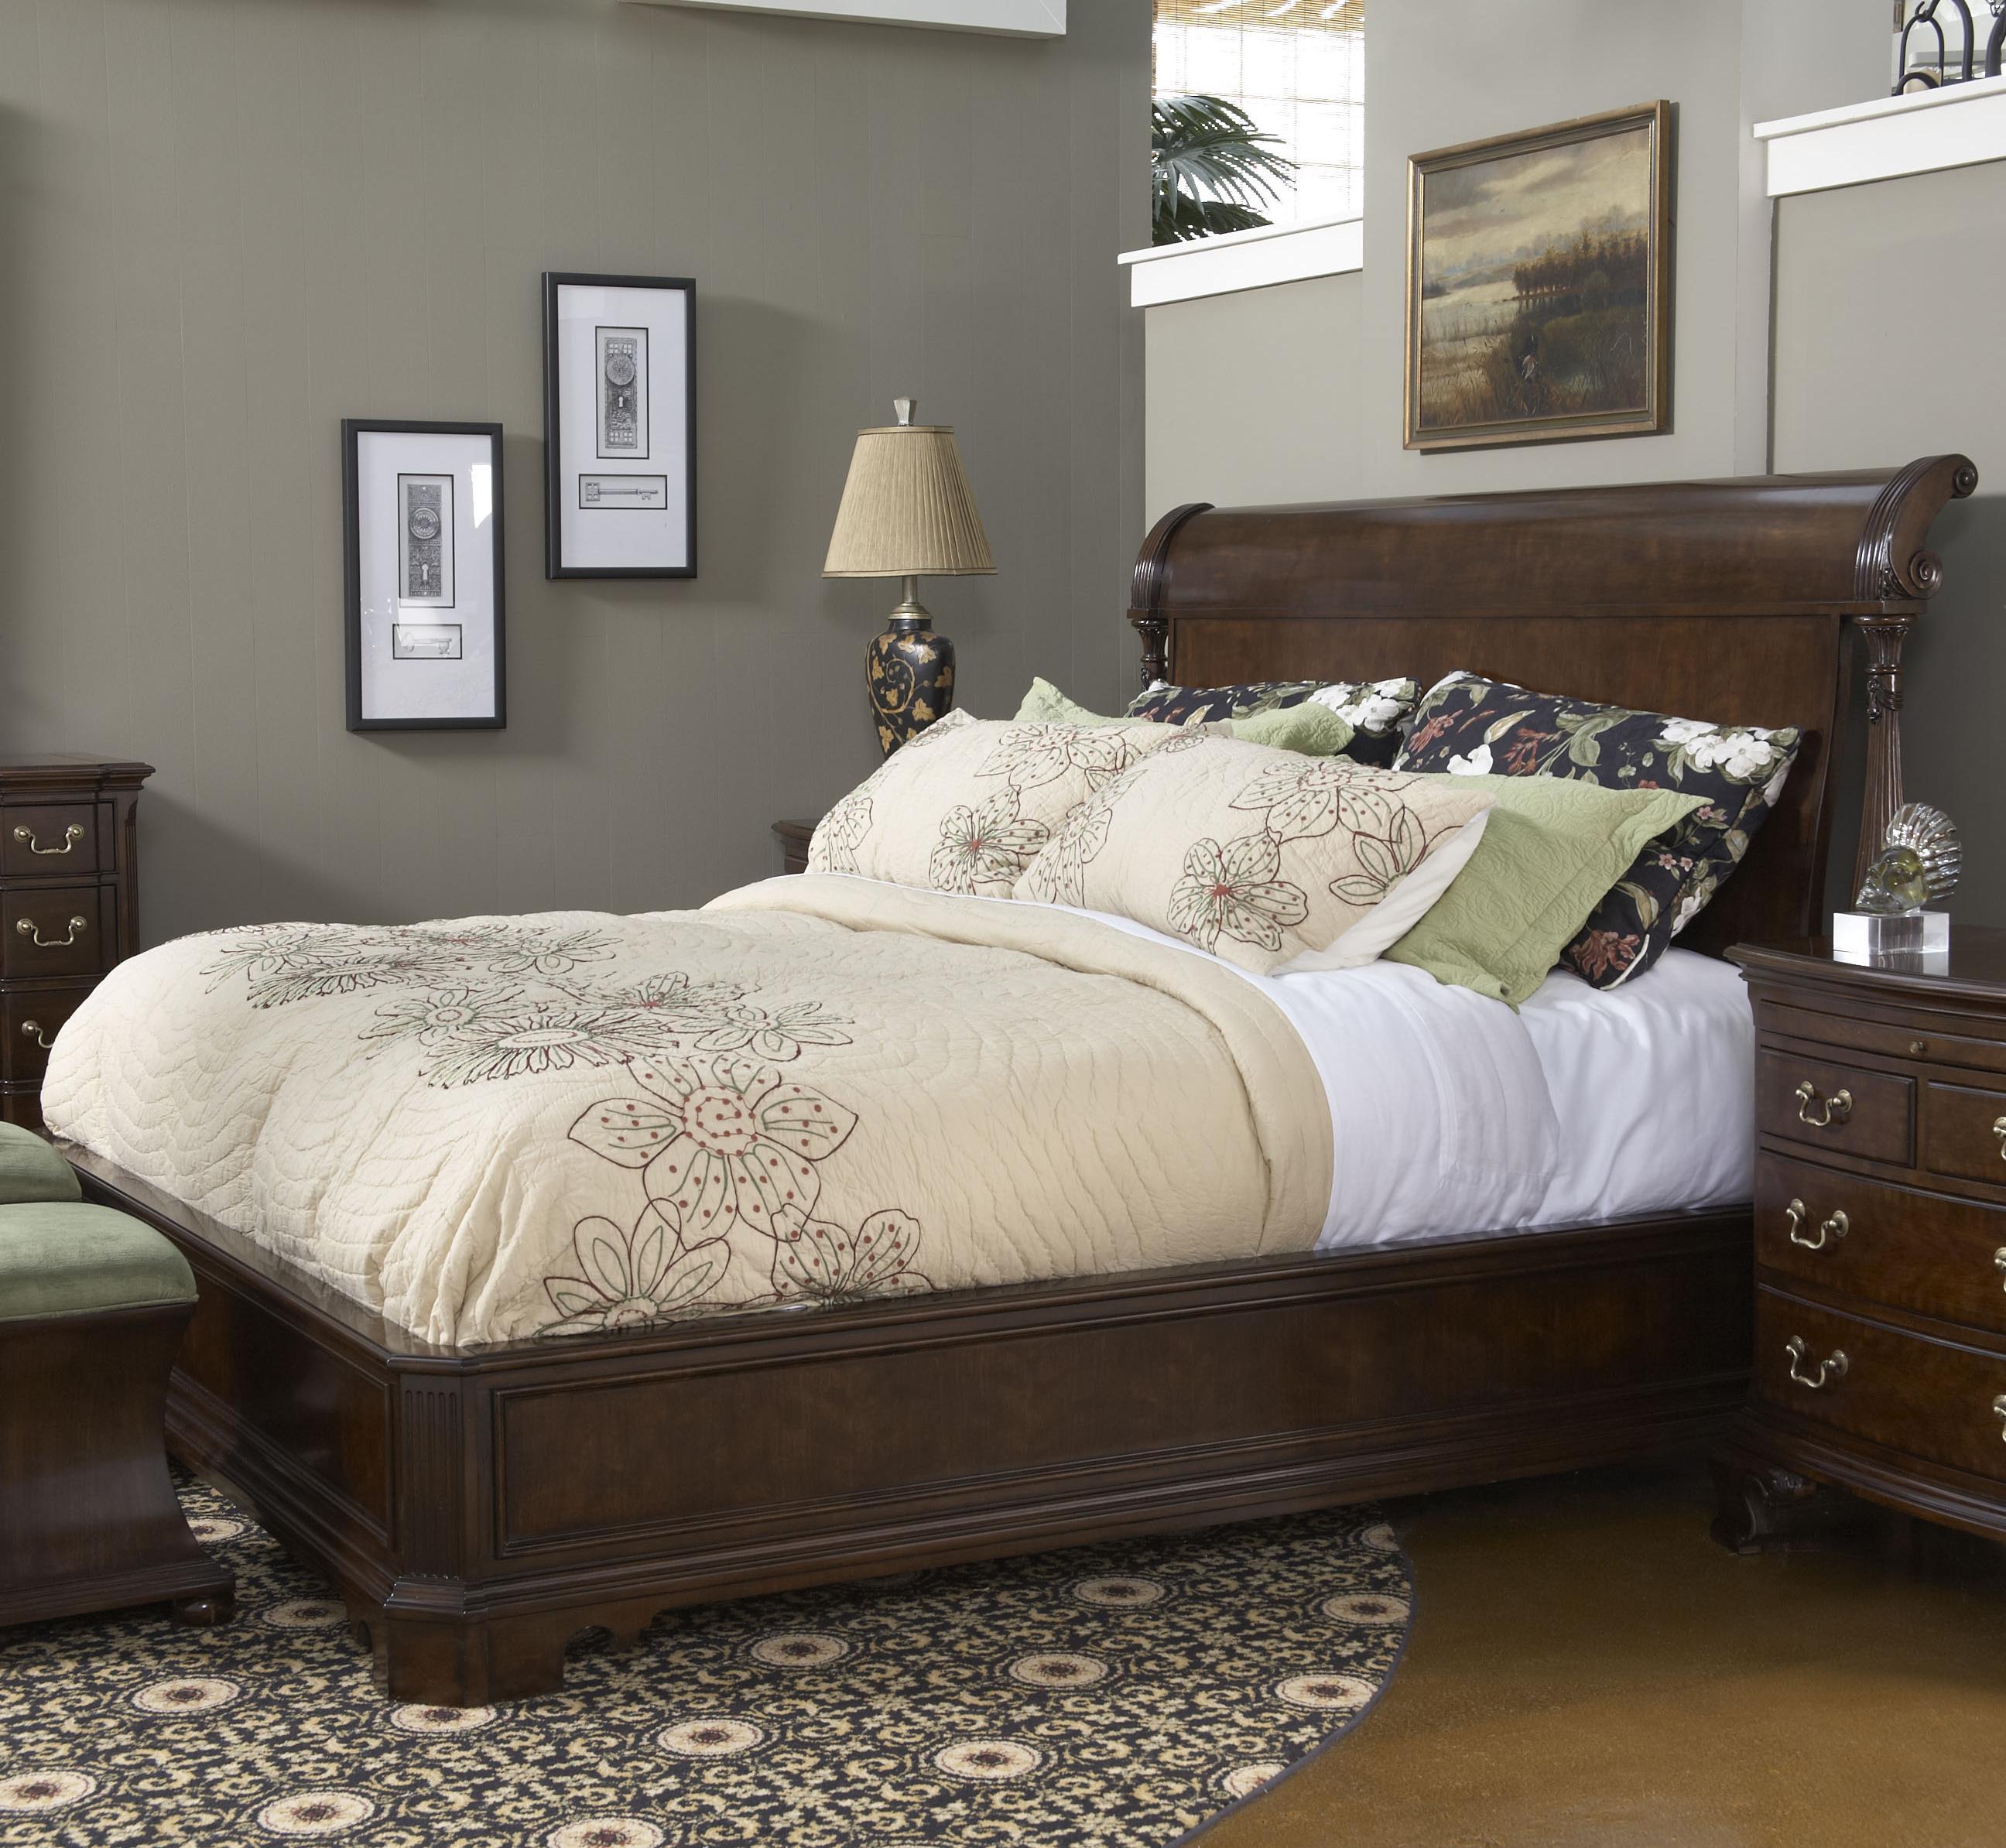 belfort signature belmont king size charleston platform panel bed with rounded headboard. Black Bedroom Furniture Sets. Home Design Ideas